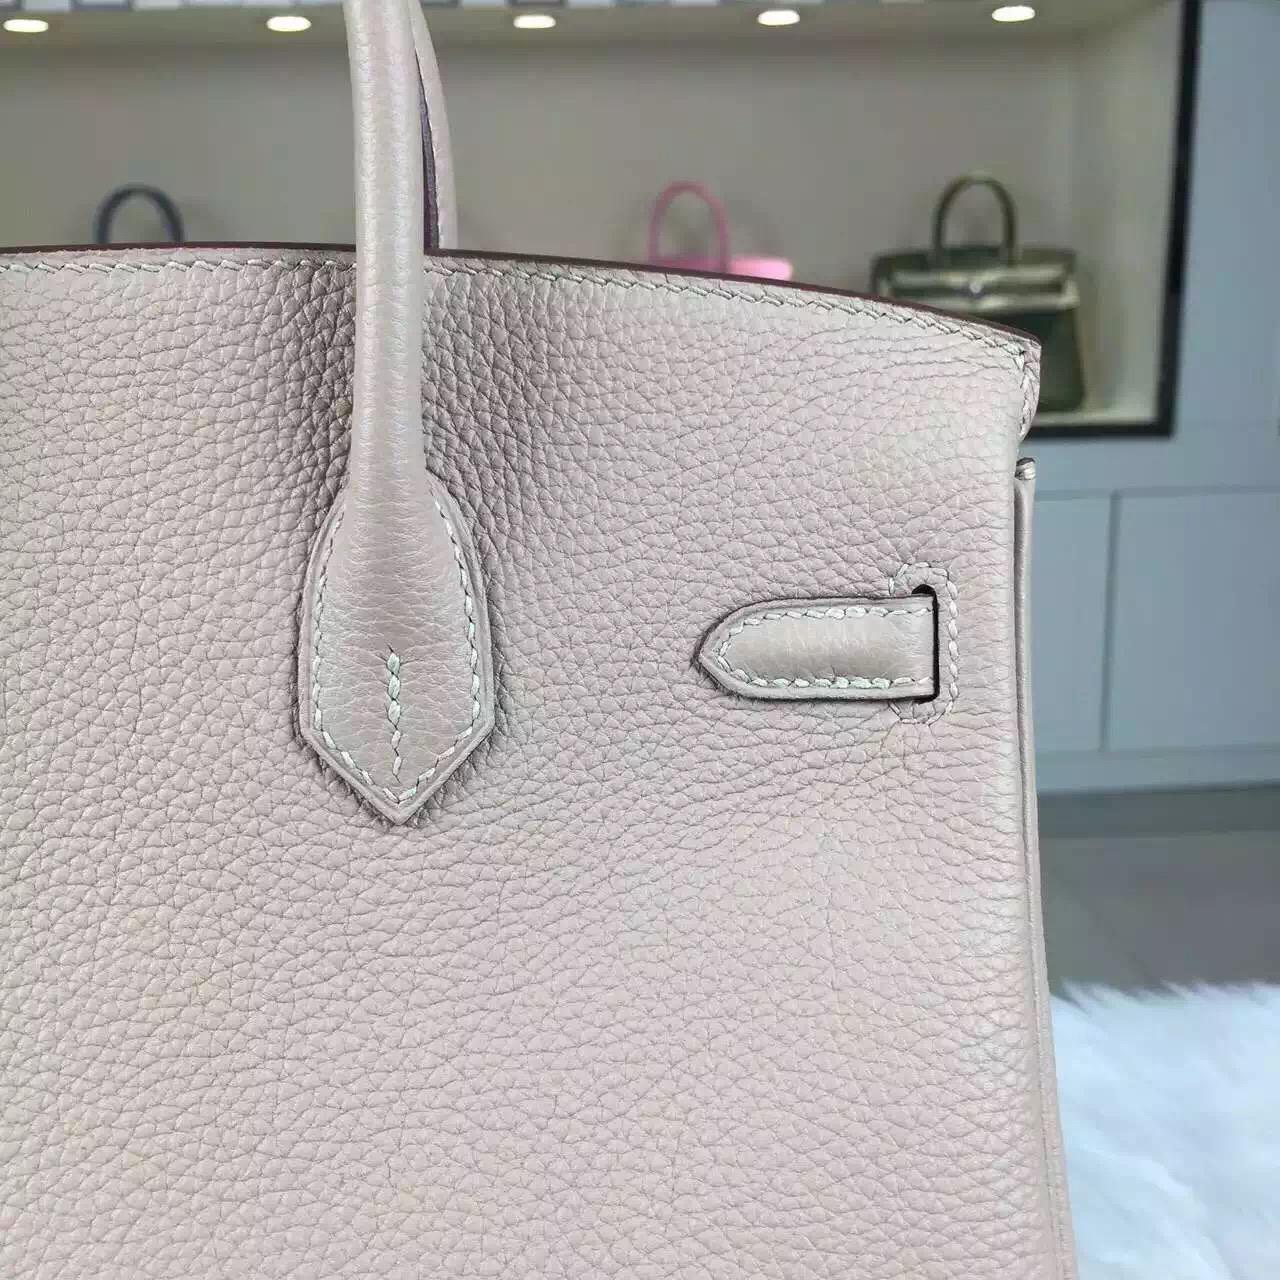 Luxury Hermes Birkin25 1F Diamond Grey Togo Calfskin Leather Women's Tote